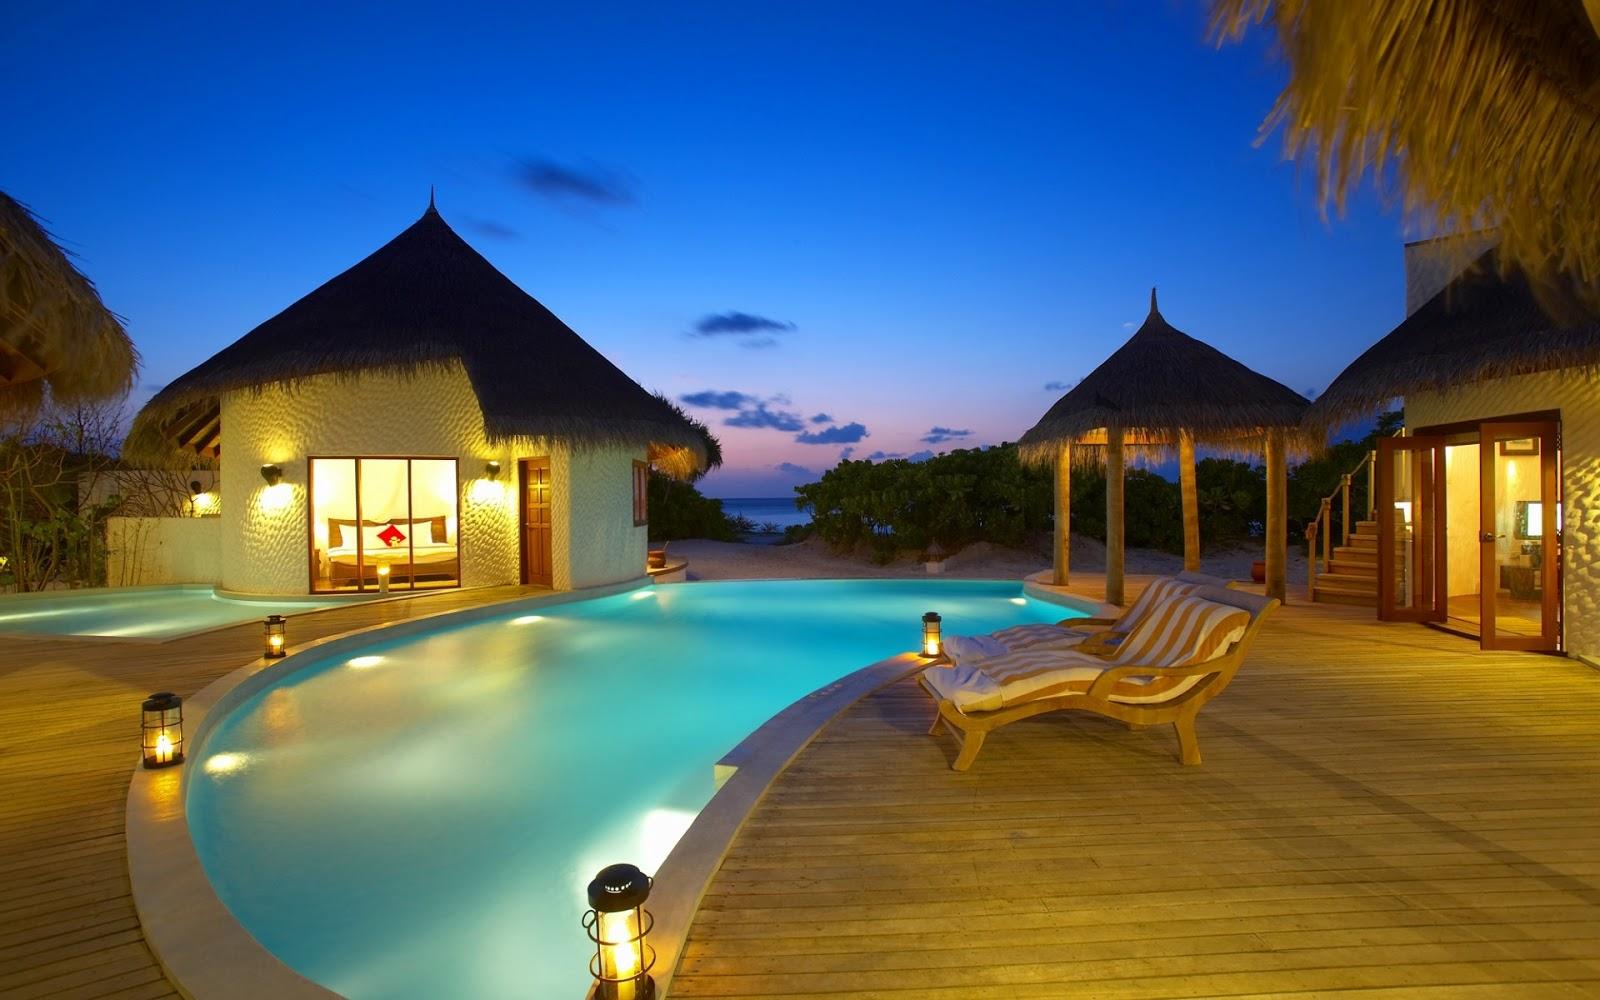 Hotel hesperia playa el agua vicky travels for Hoteles en el agua maldivas